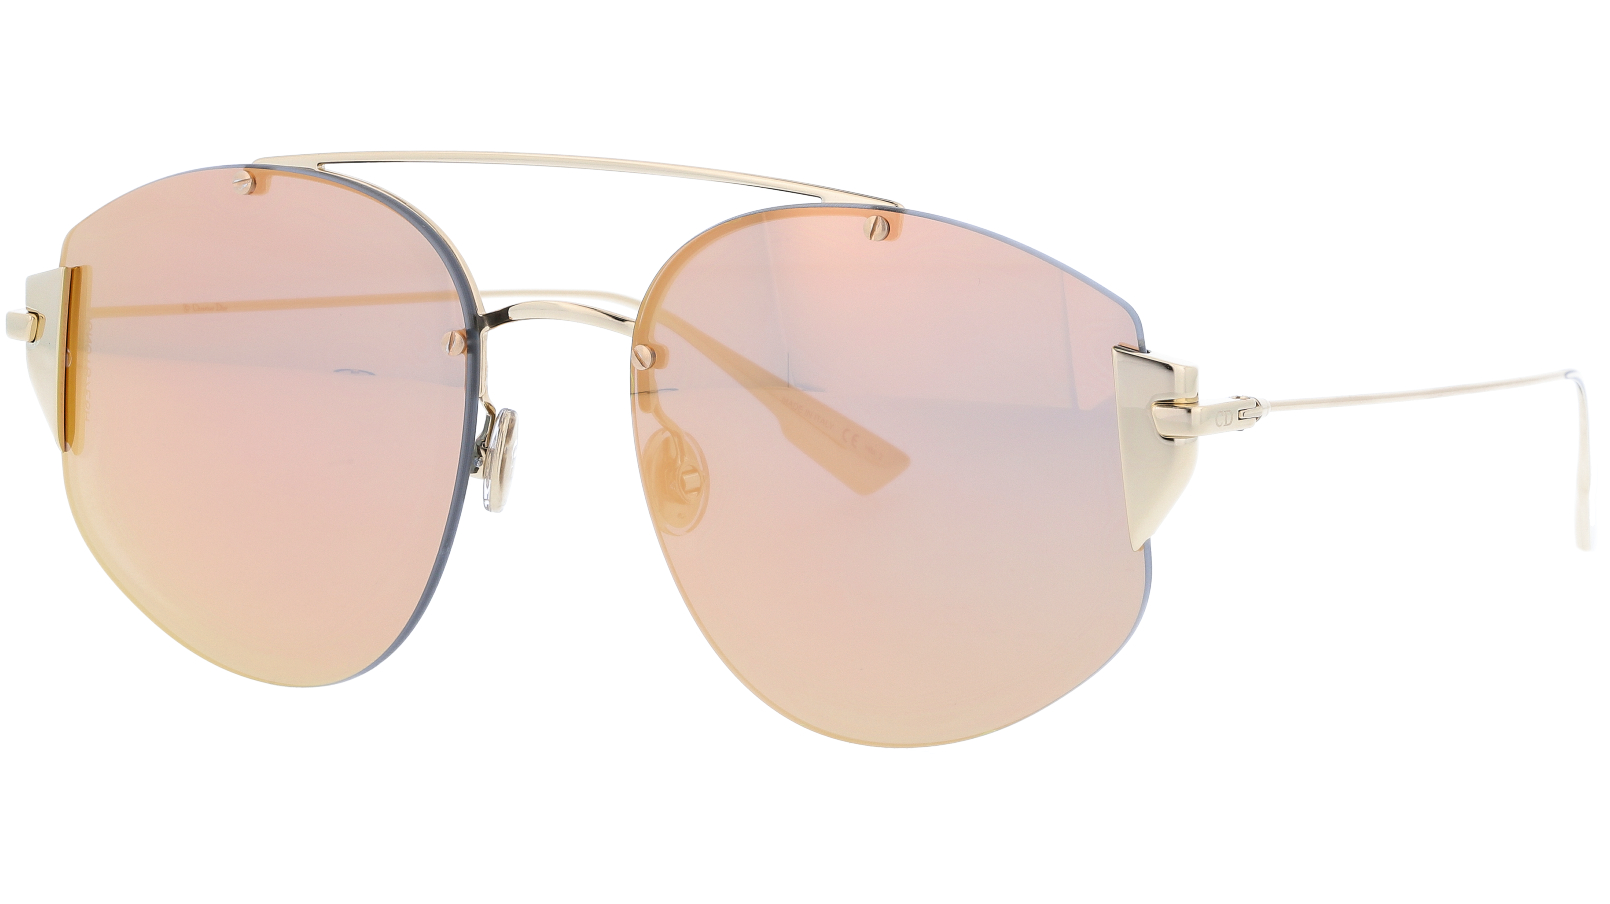 Dior STRONGER J5G0J 58 Gold Sunglasses